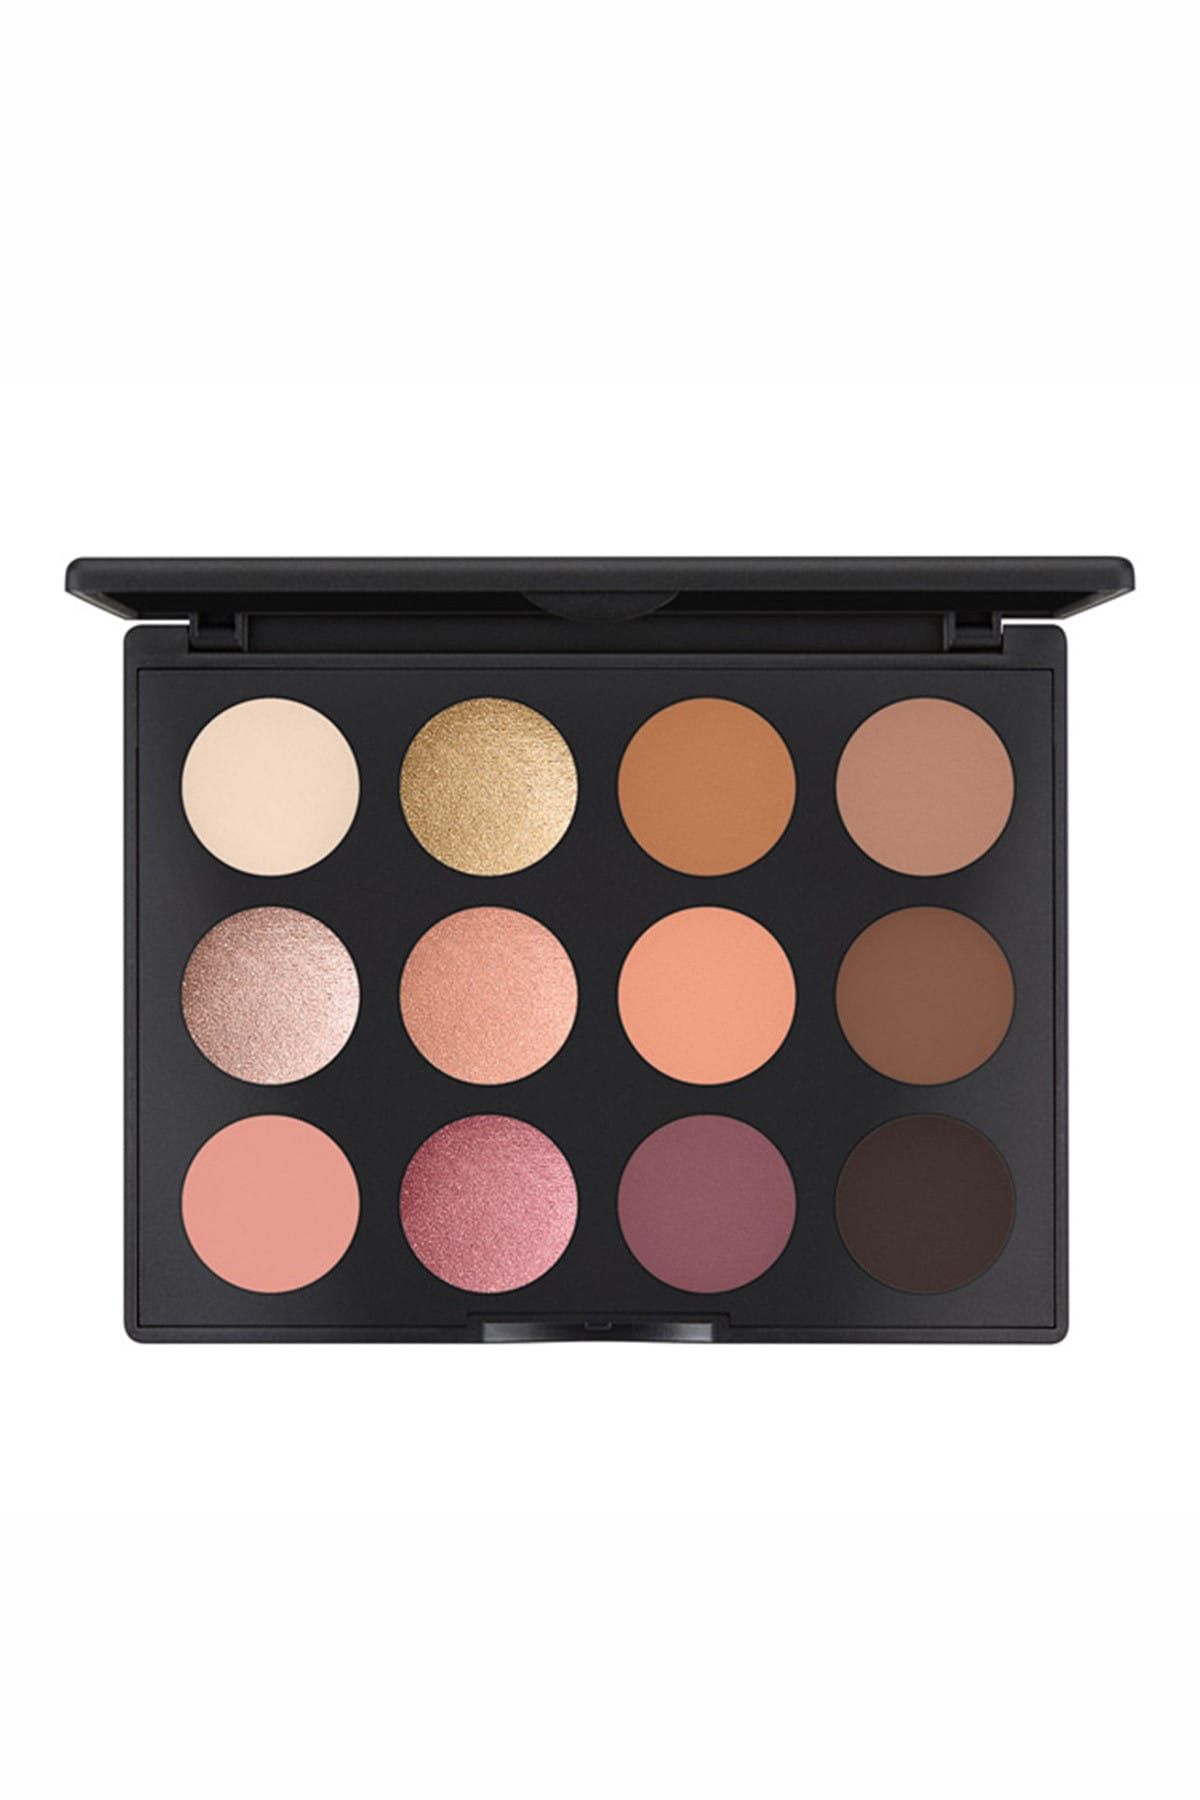 Far Paleti - Art Library: Nude Model Eye Shadow Palette 17.2 g 773602543663